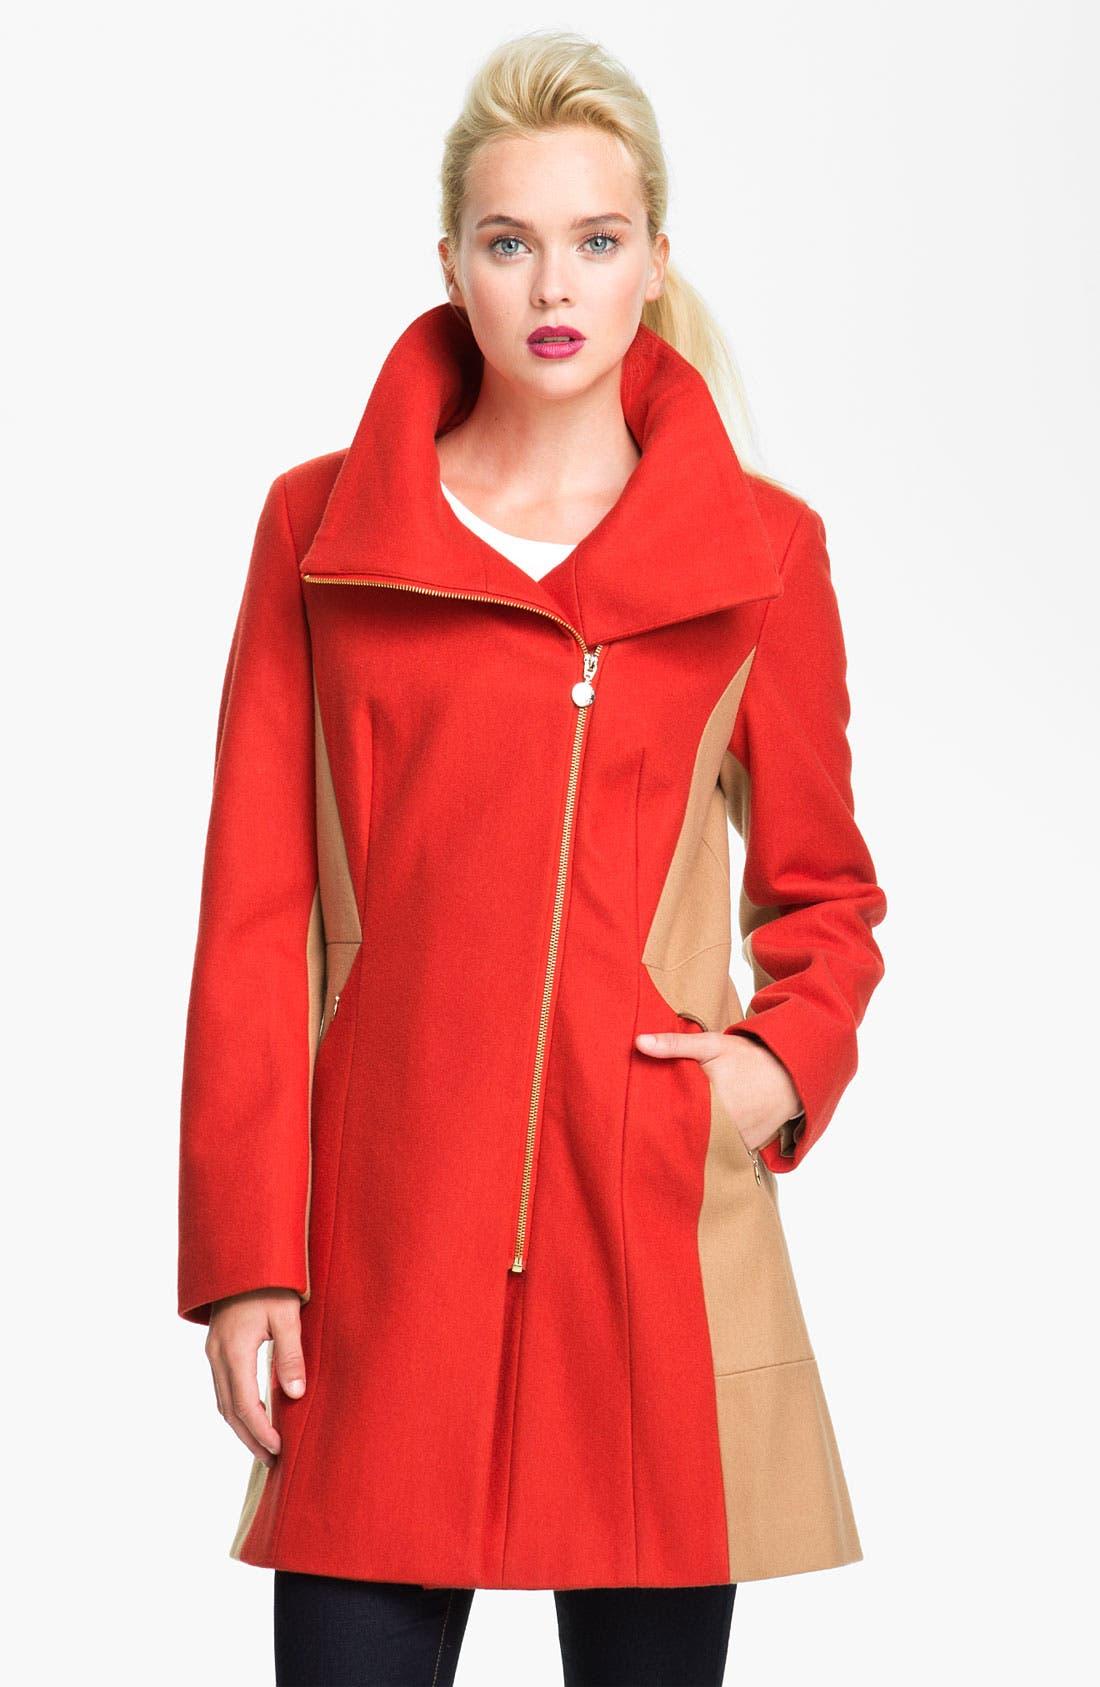 Alternate Image 1 Selected - Calvin Klein Two Tone Asymmetrical Walking Coat